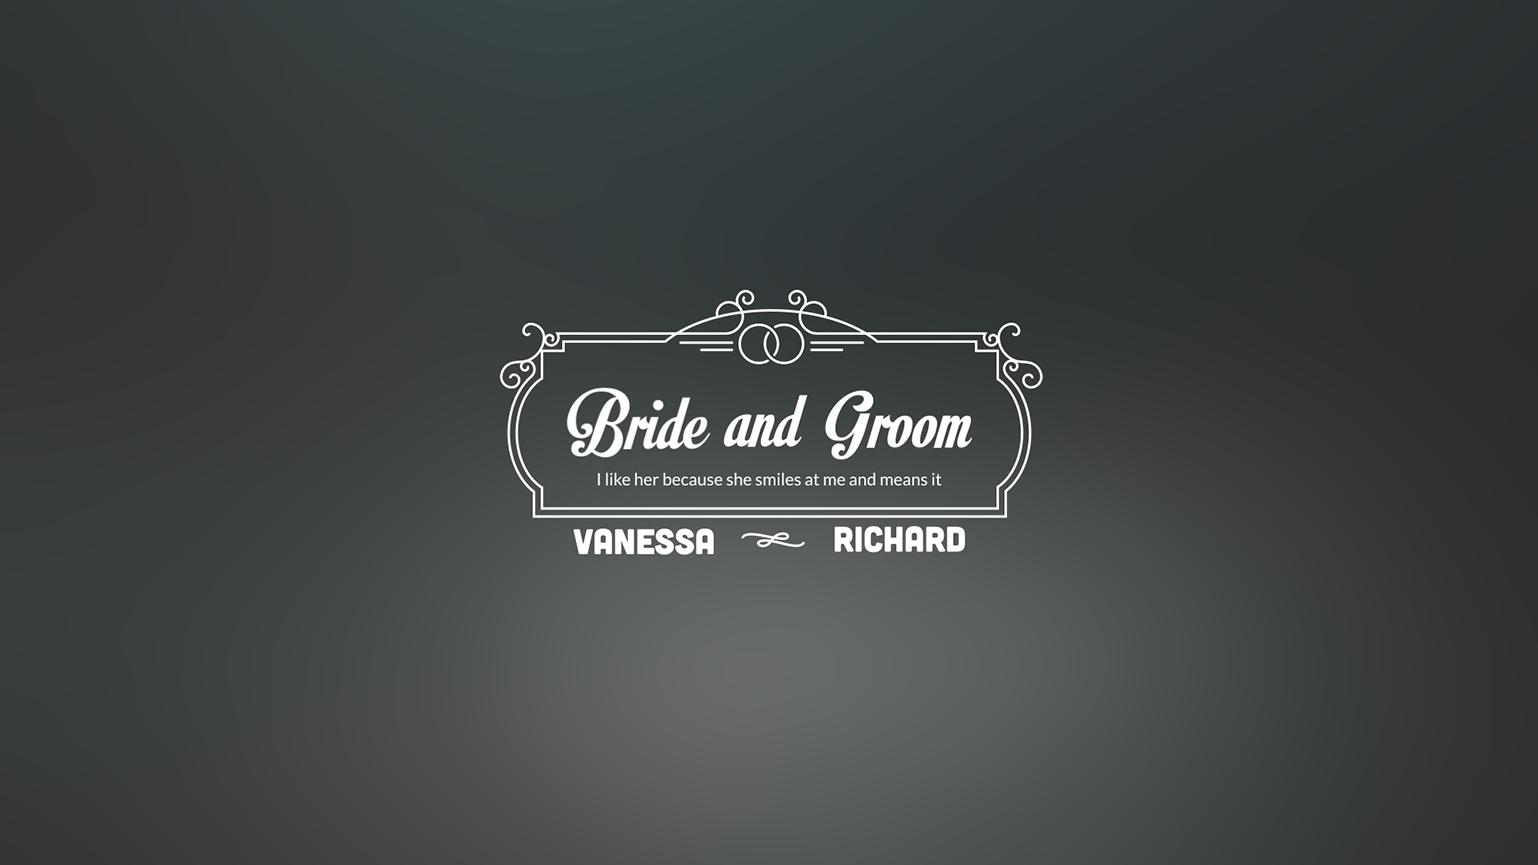 100 Luxury Wedding Titles In 2020 Wedding Titles Music Pictures Luxury Wedding